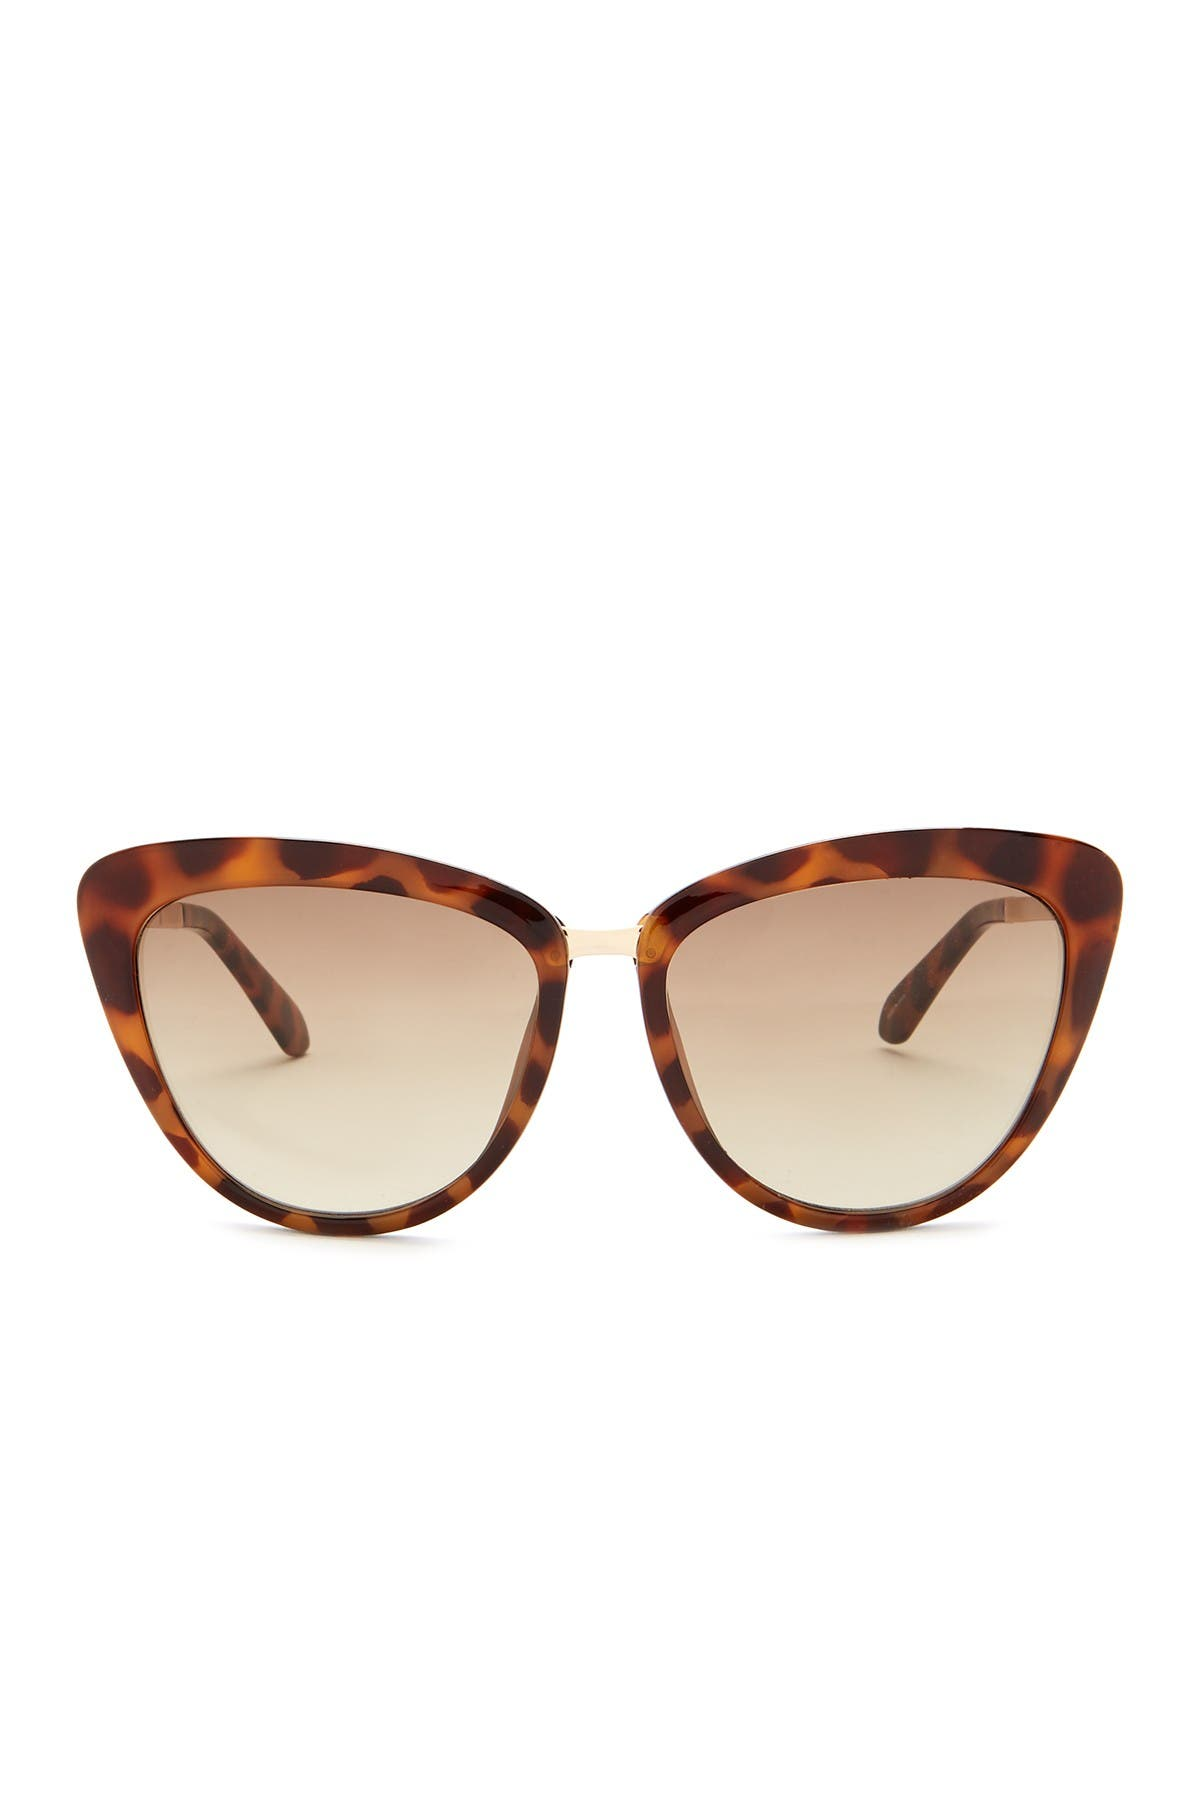 Image of kate spade new york cissy 56mm cat eye sunglasses